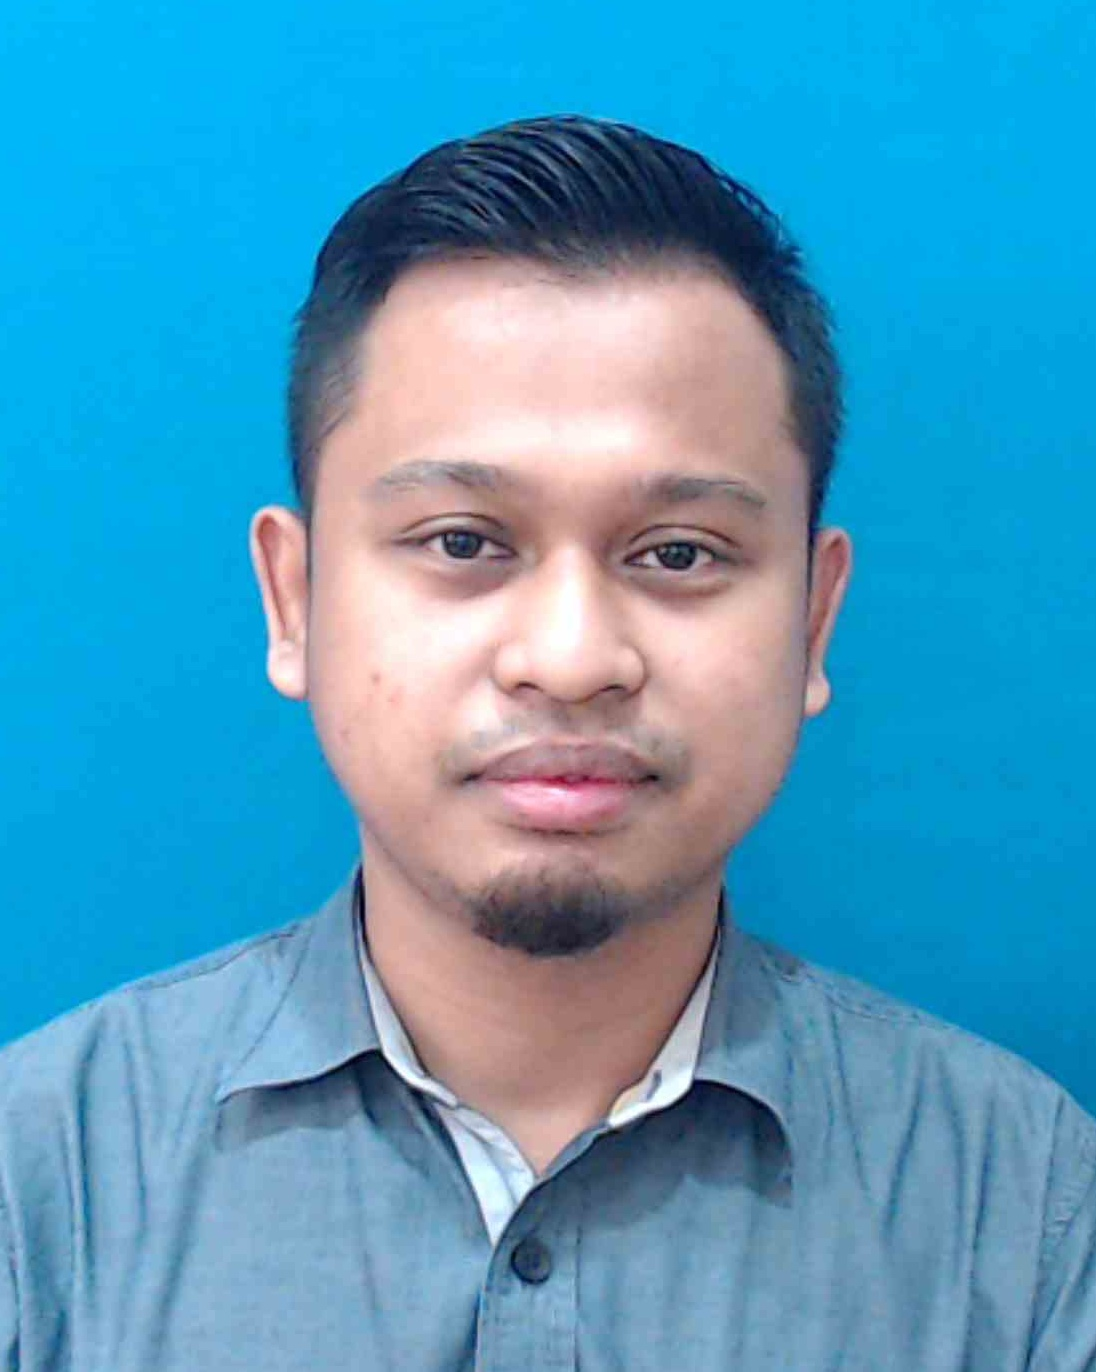 Muhammad Rizal Bin Marsudin